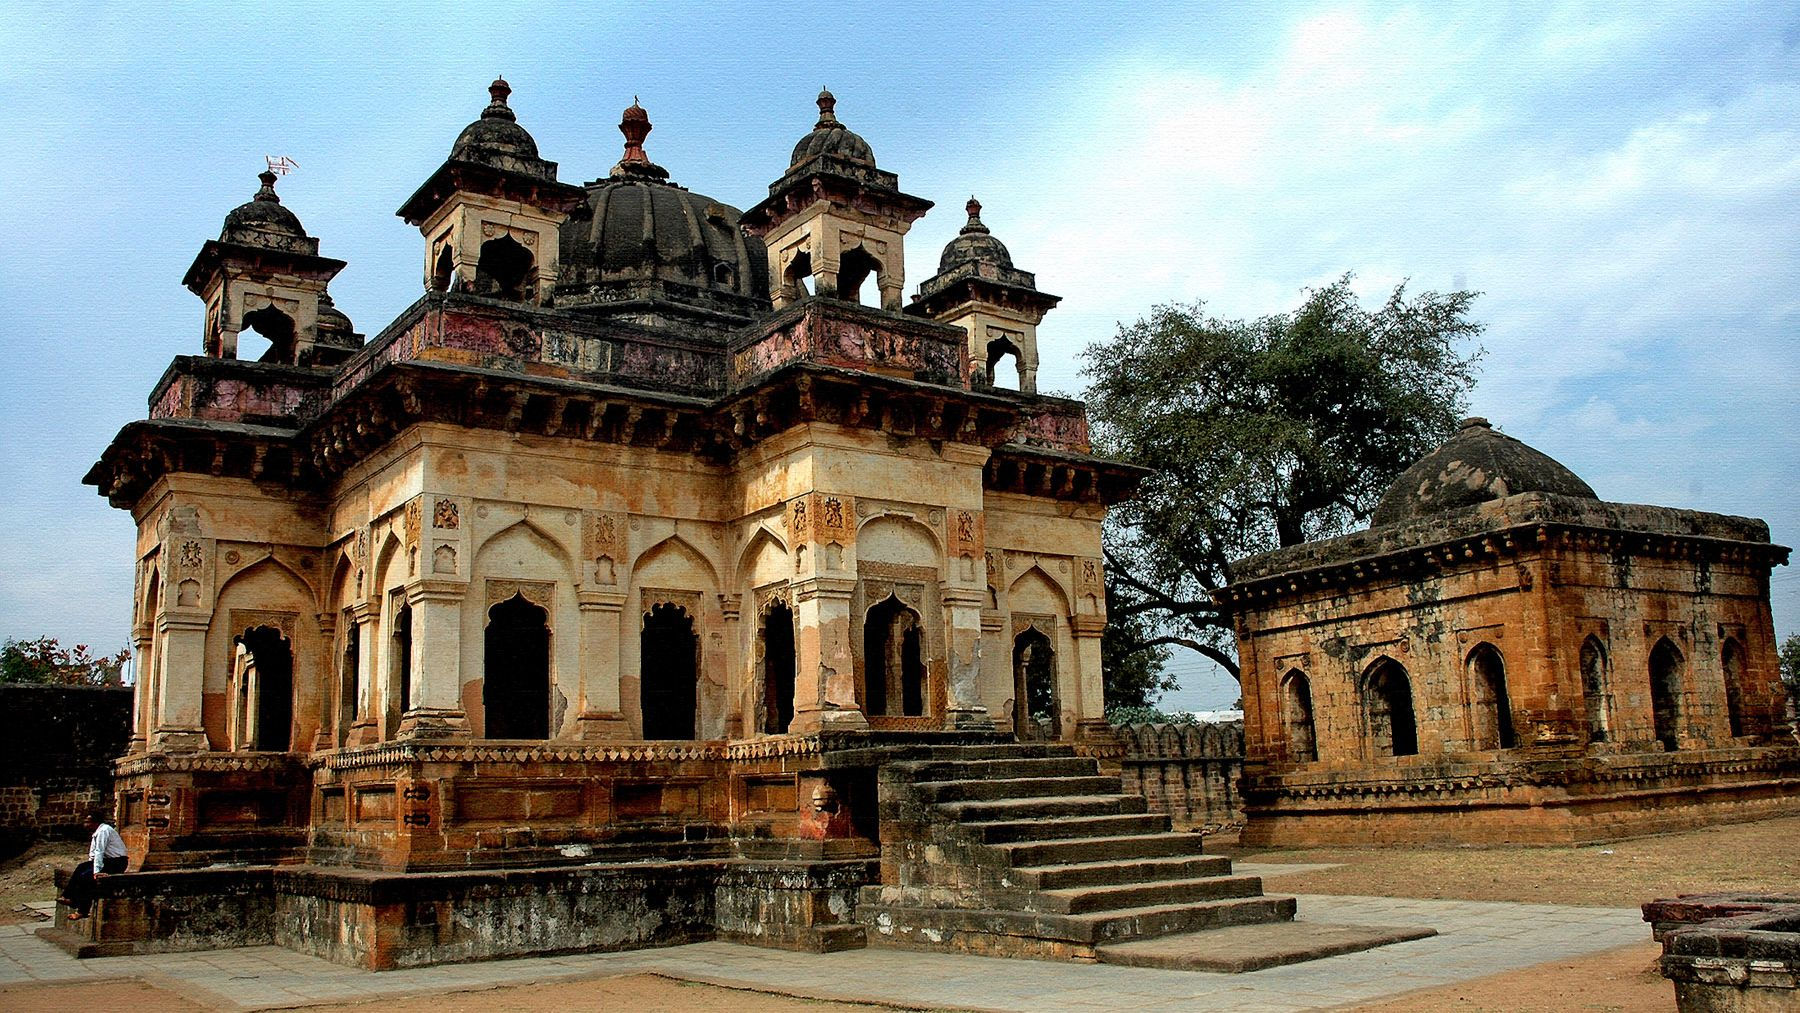 Chandrapur's Royal Gond Legacy